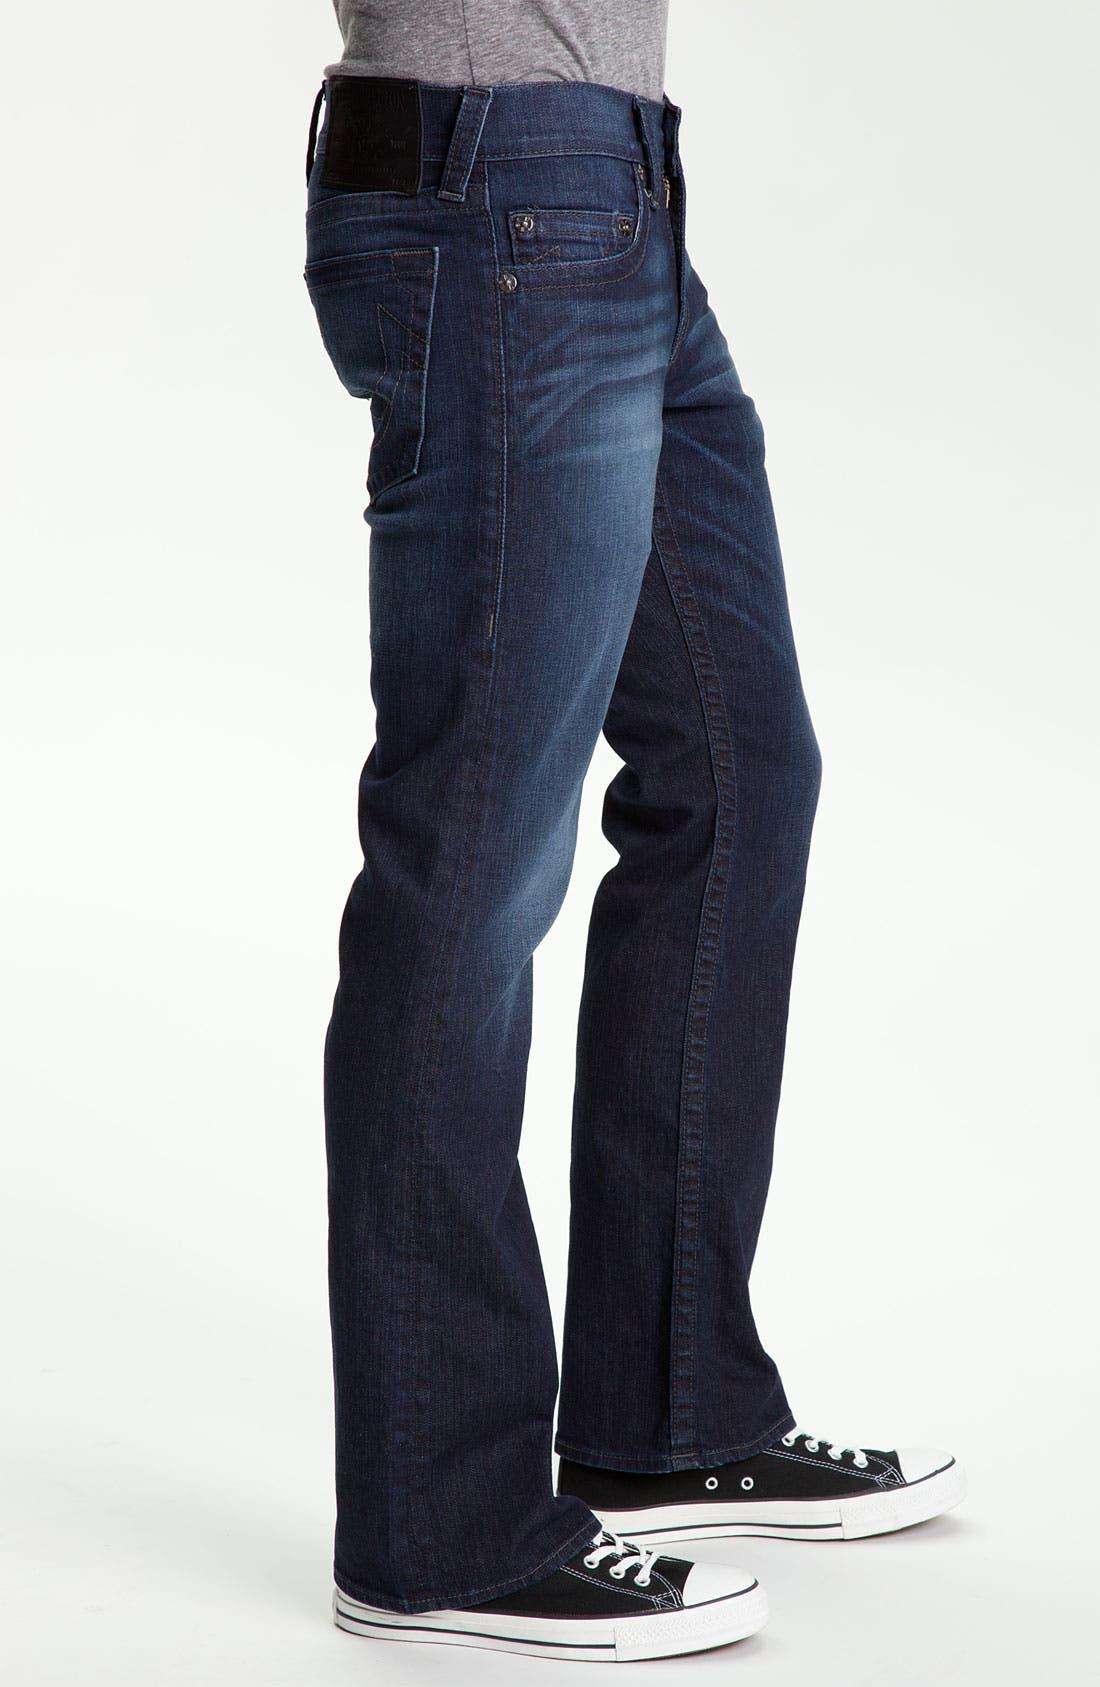 Alternate Image 3  - True Religion Brand Jeans 'Danny' Bootcut Jeans (Franklin)